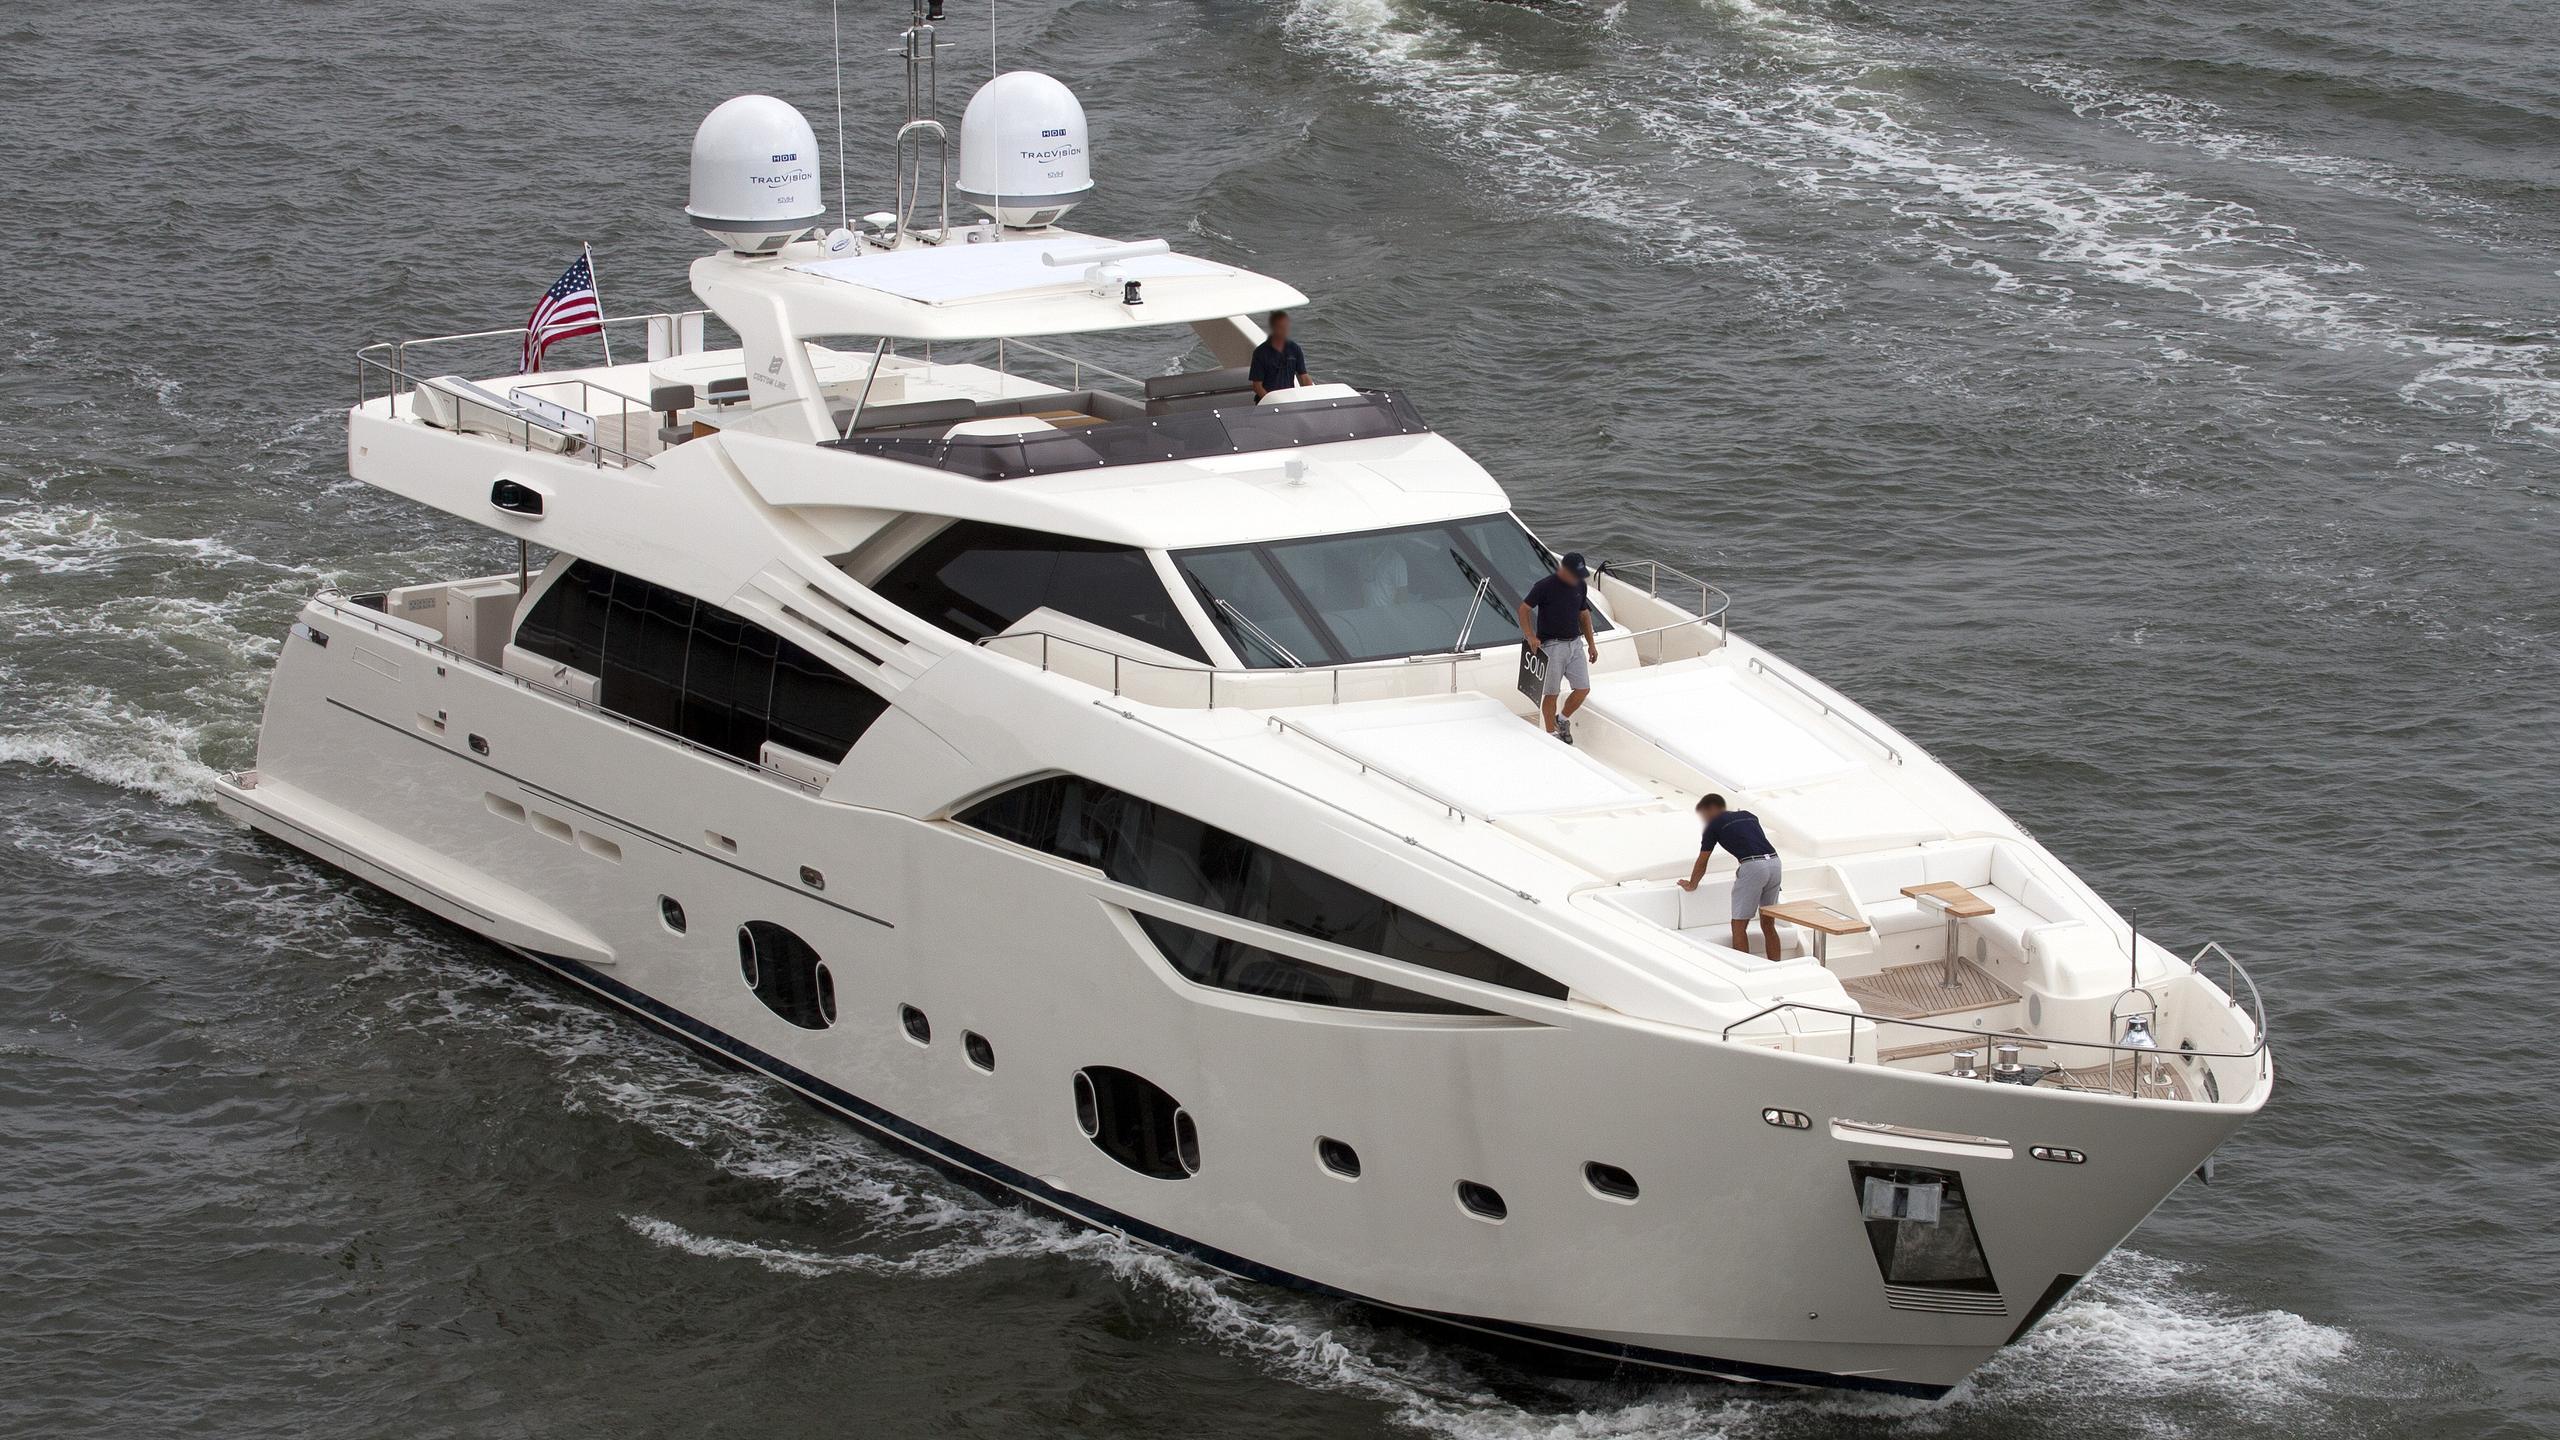 sha-sha-sha-iv-yacht-exterior